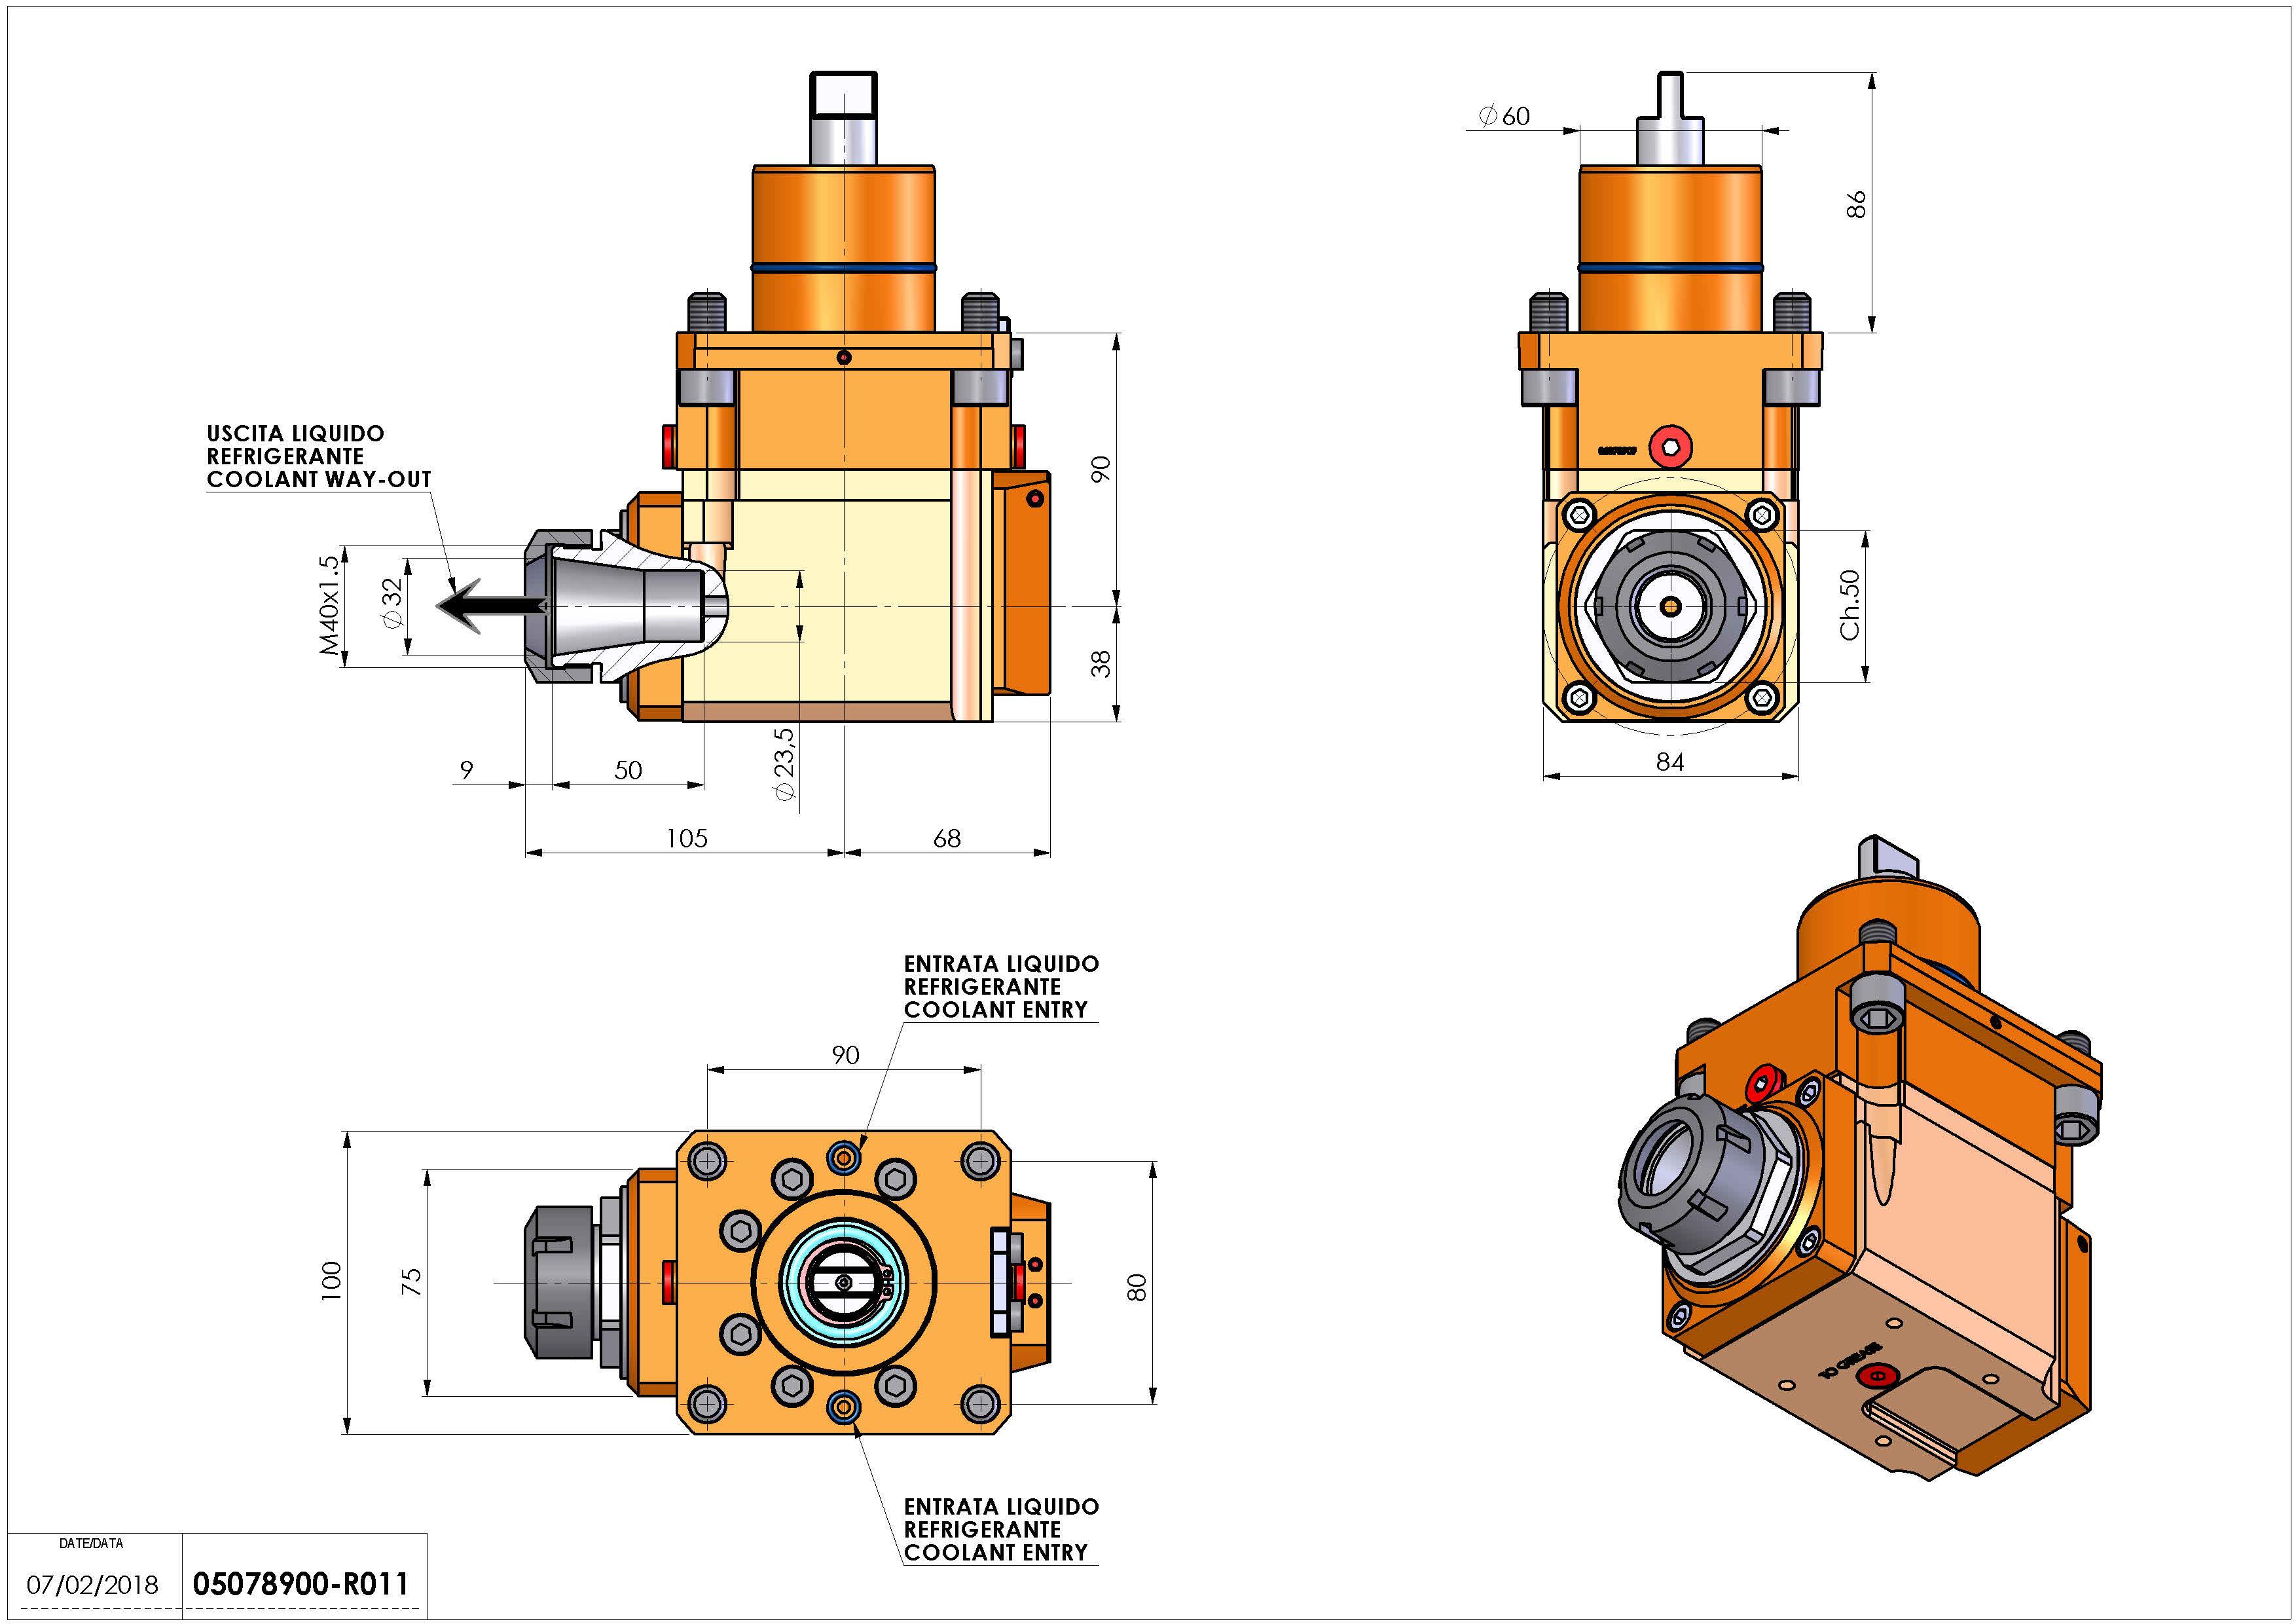 Technical image - LT-A D60 ER32 LR RF H90.